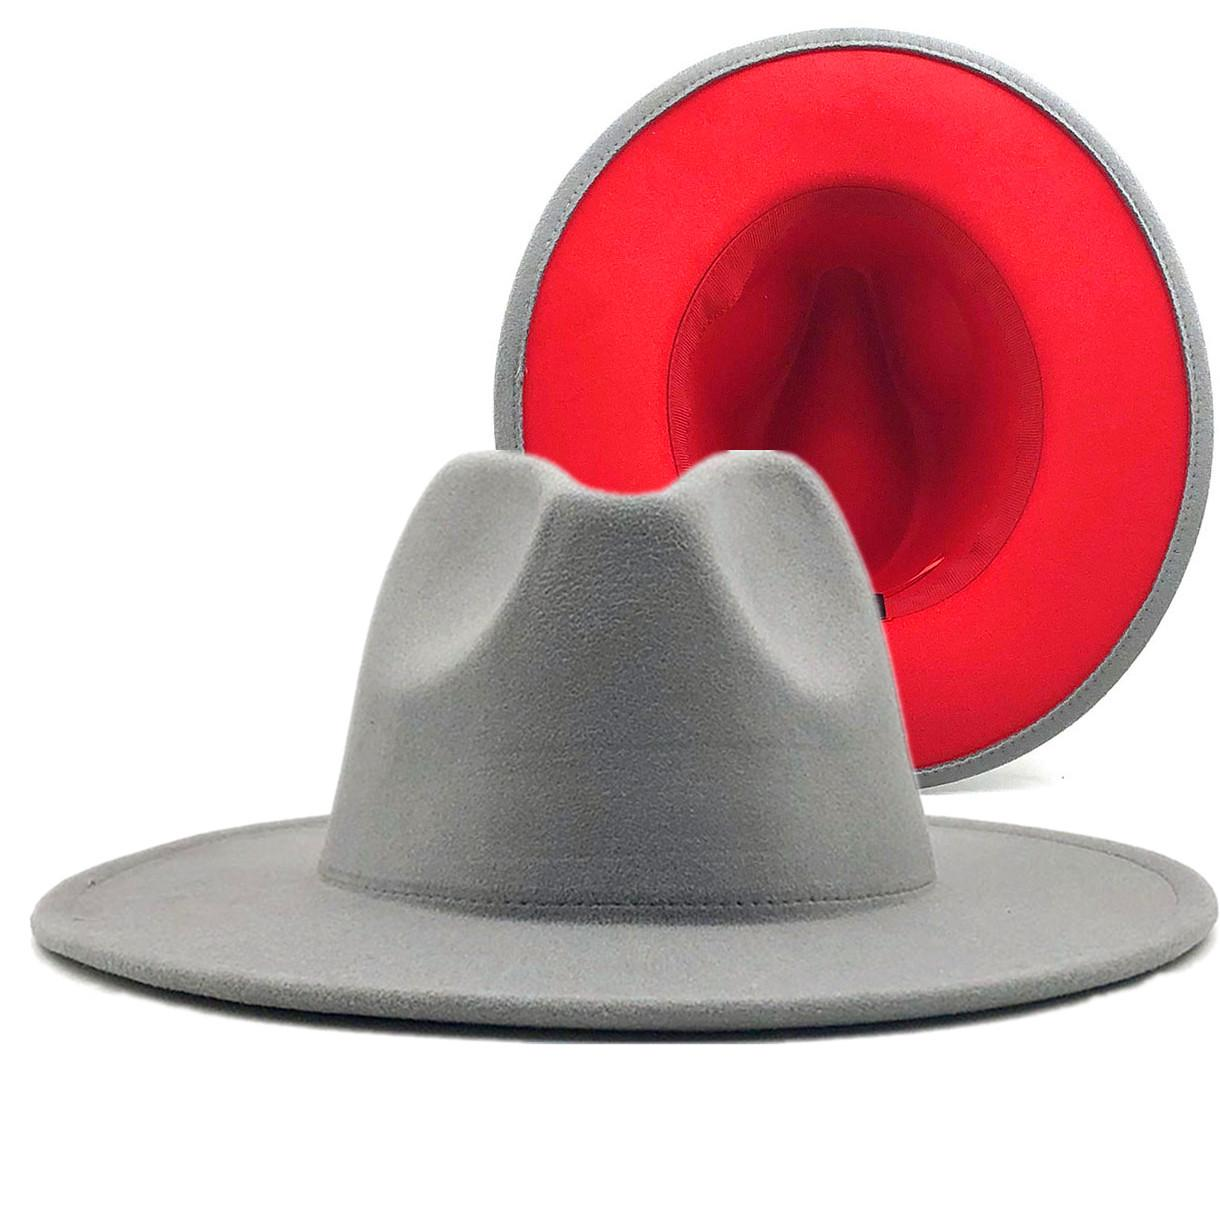 Caz Fedora Şapka Bayan Unisex Geniş Brim Panama Parti Trilby Kovboy Şapka Bay Gentleman Düğün Şapka XL CX200819 Keçe gri kırmızı Patchwork Yün